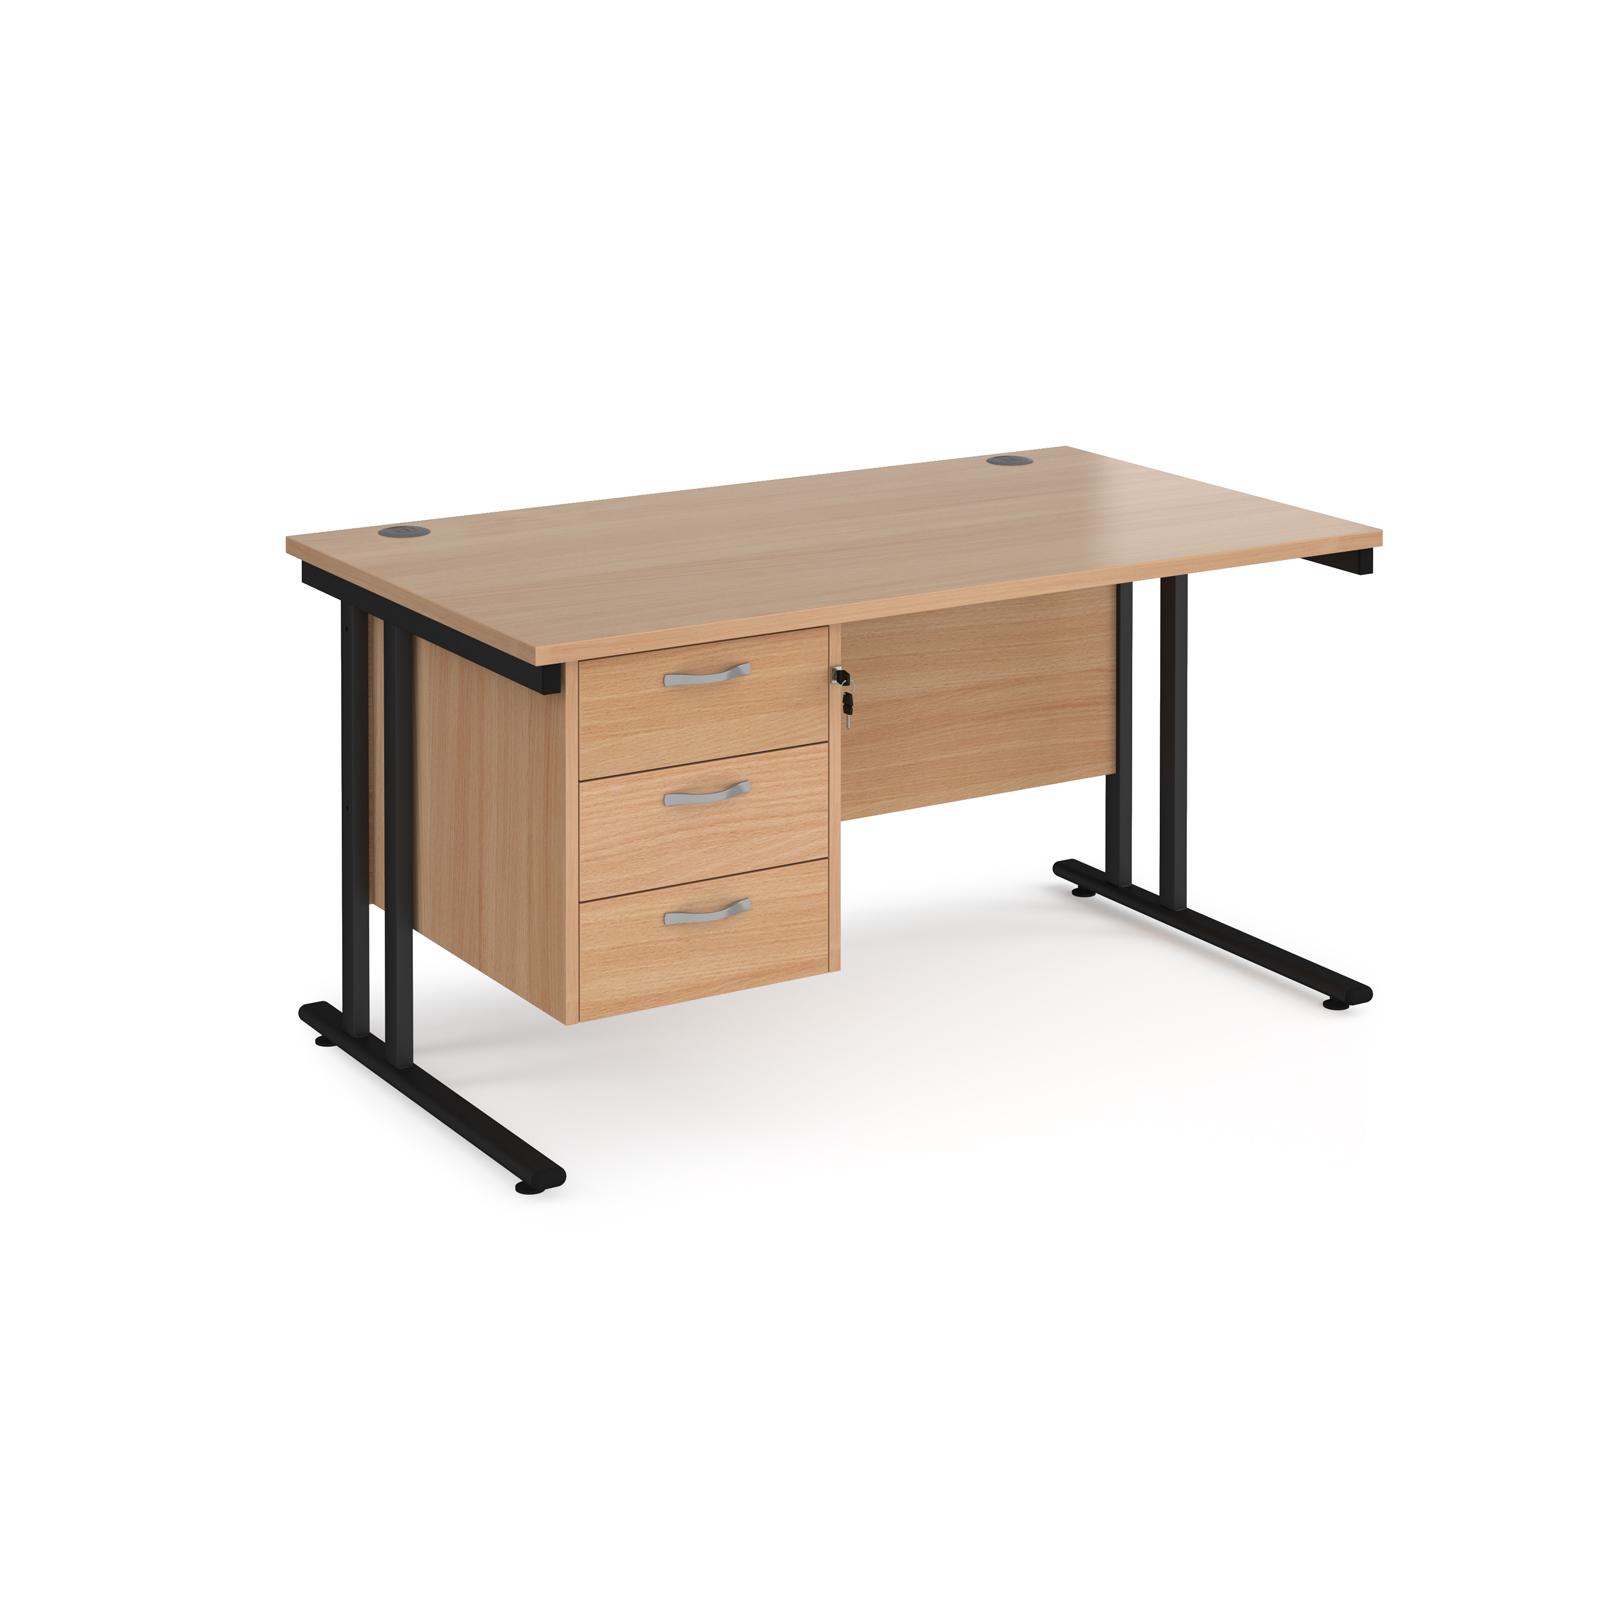 Rectangular Desks Maestro 25 straight desk 1400mm x 800mm with 3 drawer pedestal - black cantilever leg frame, beech top